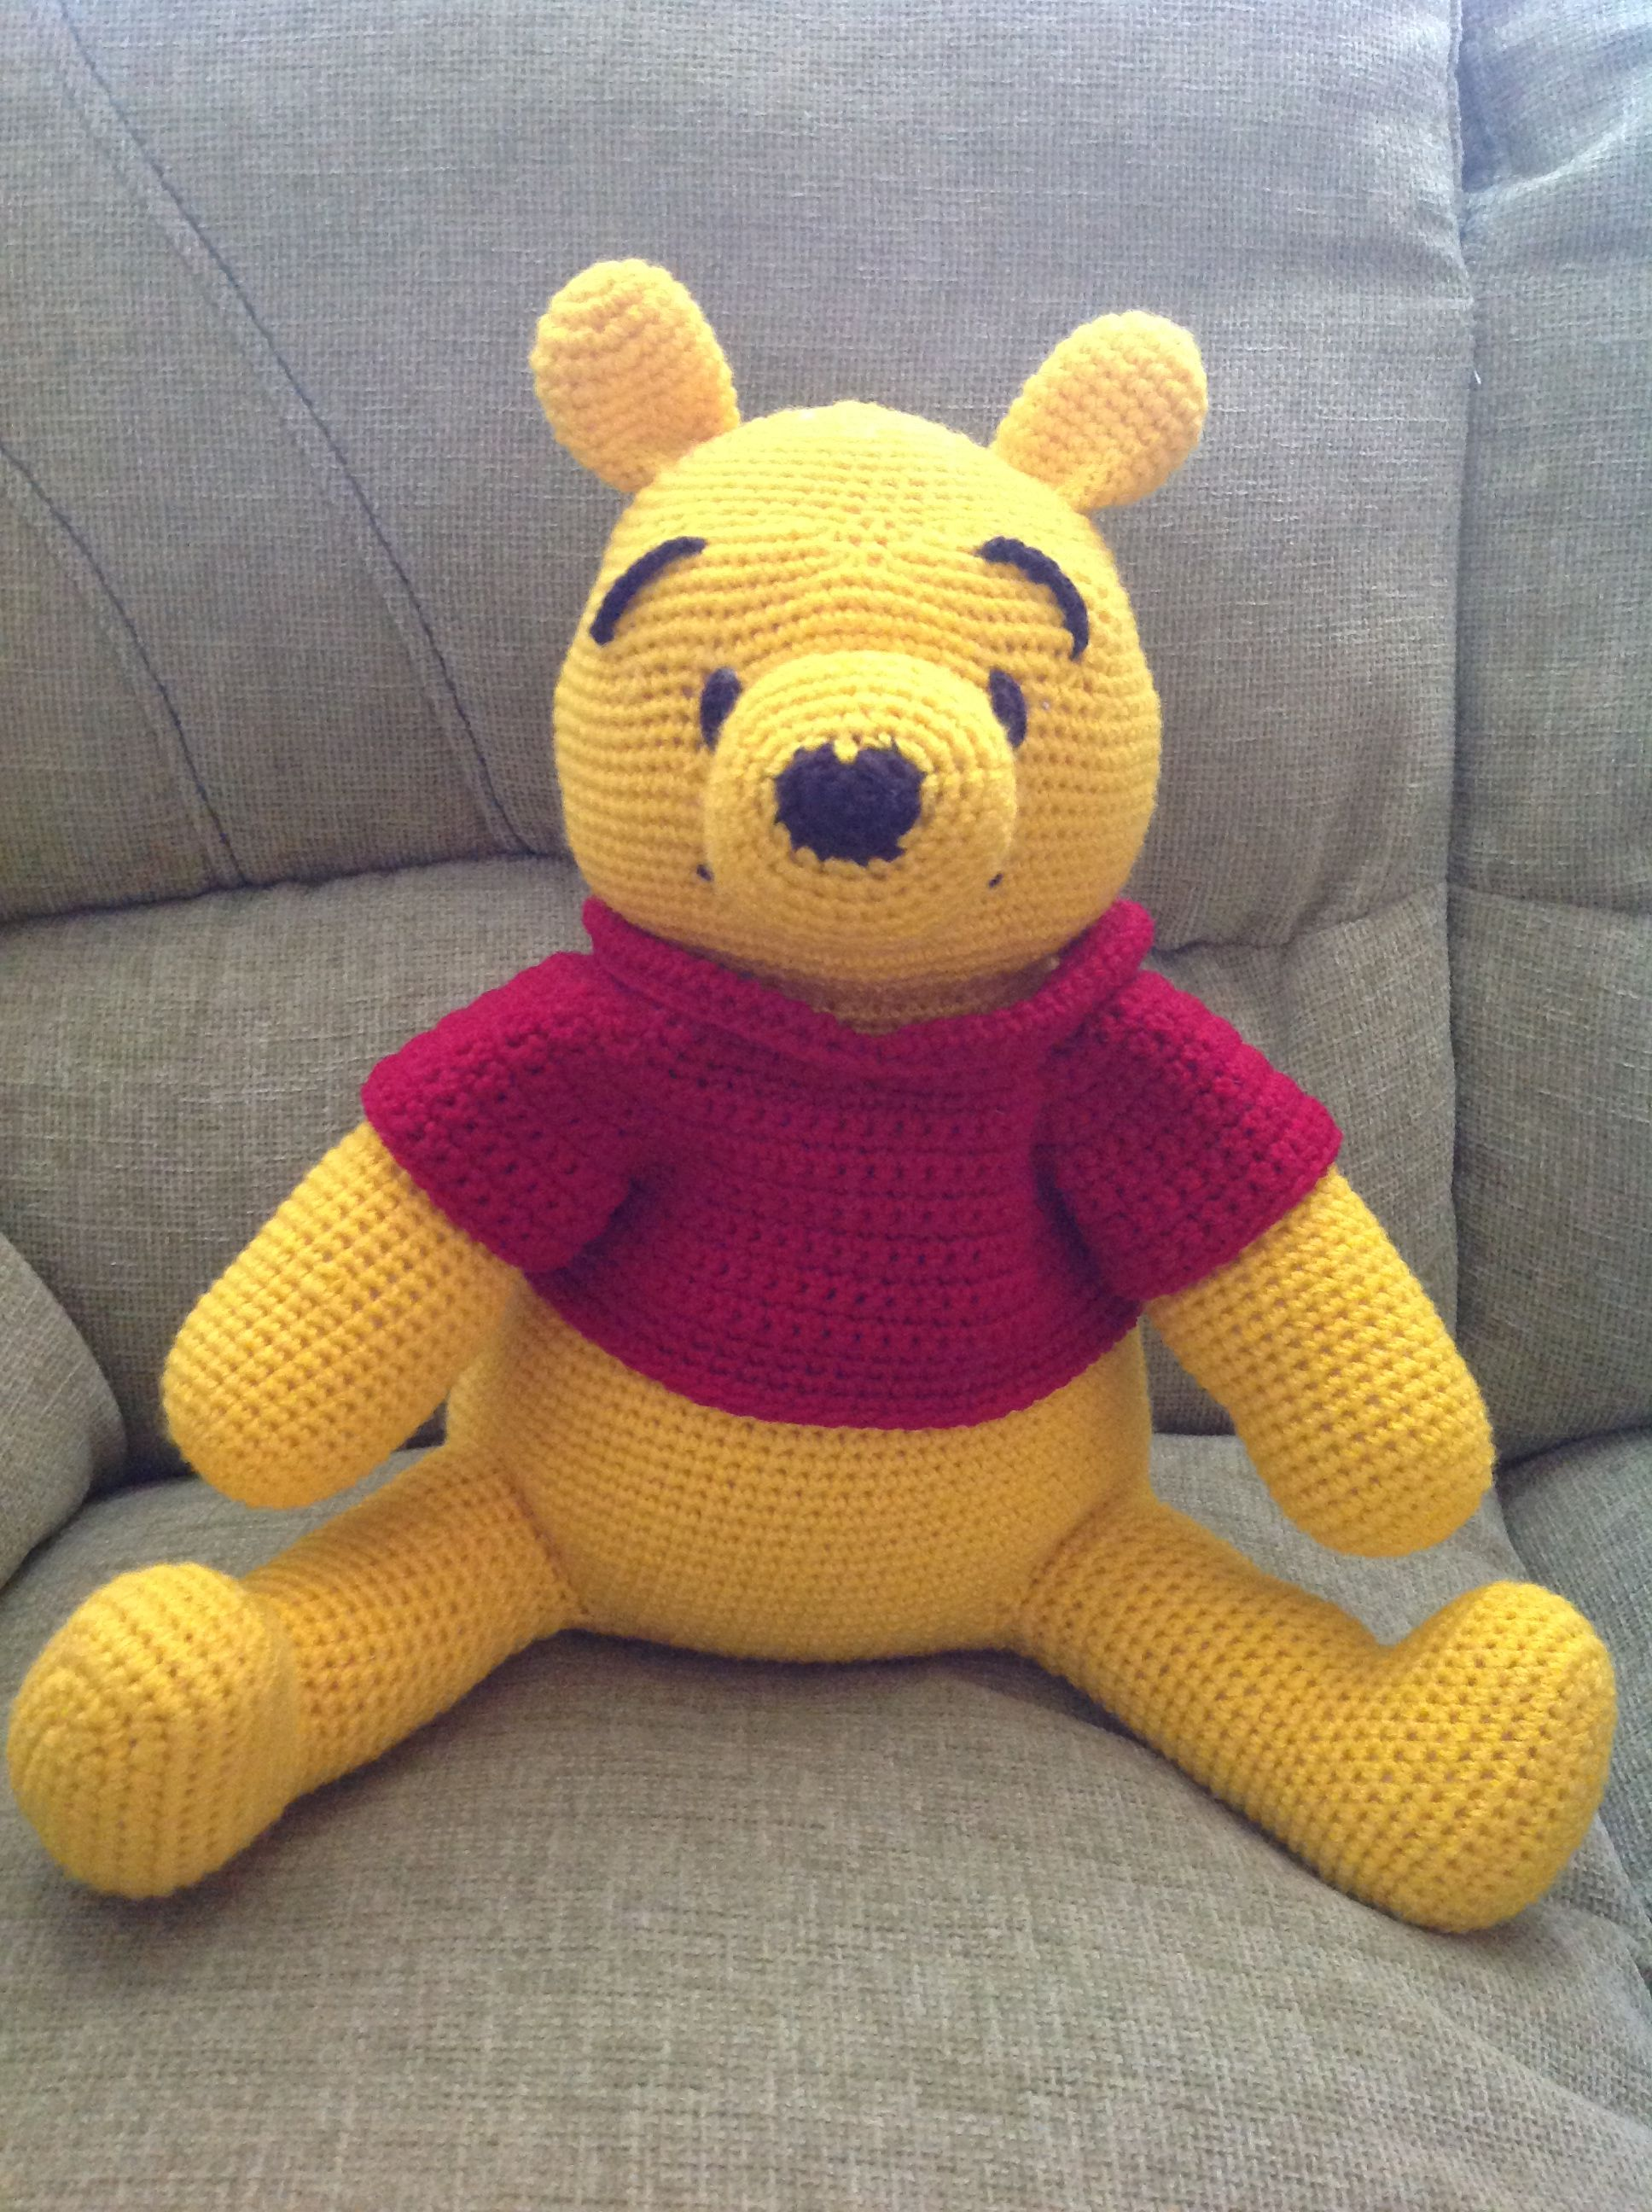 Winnie the pooh oso amarillo crochet amigurumi